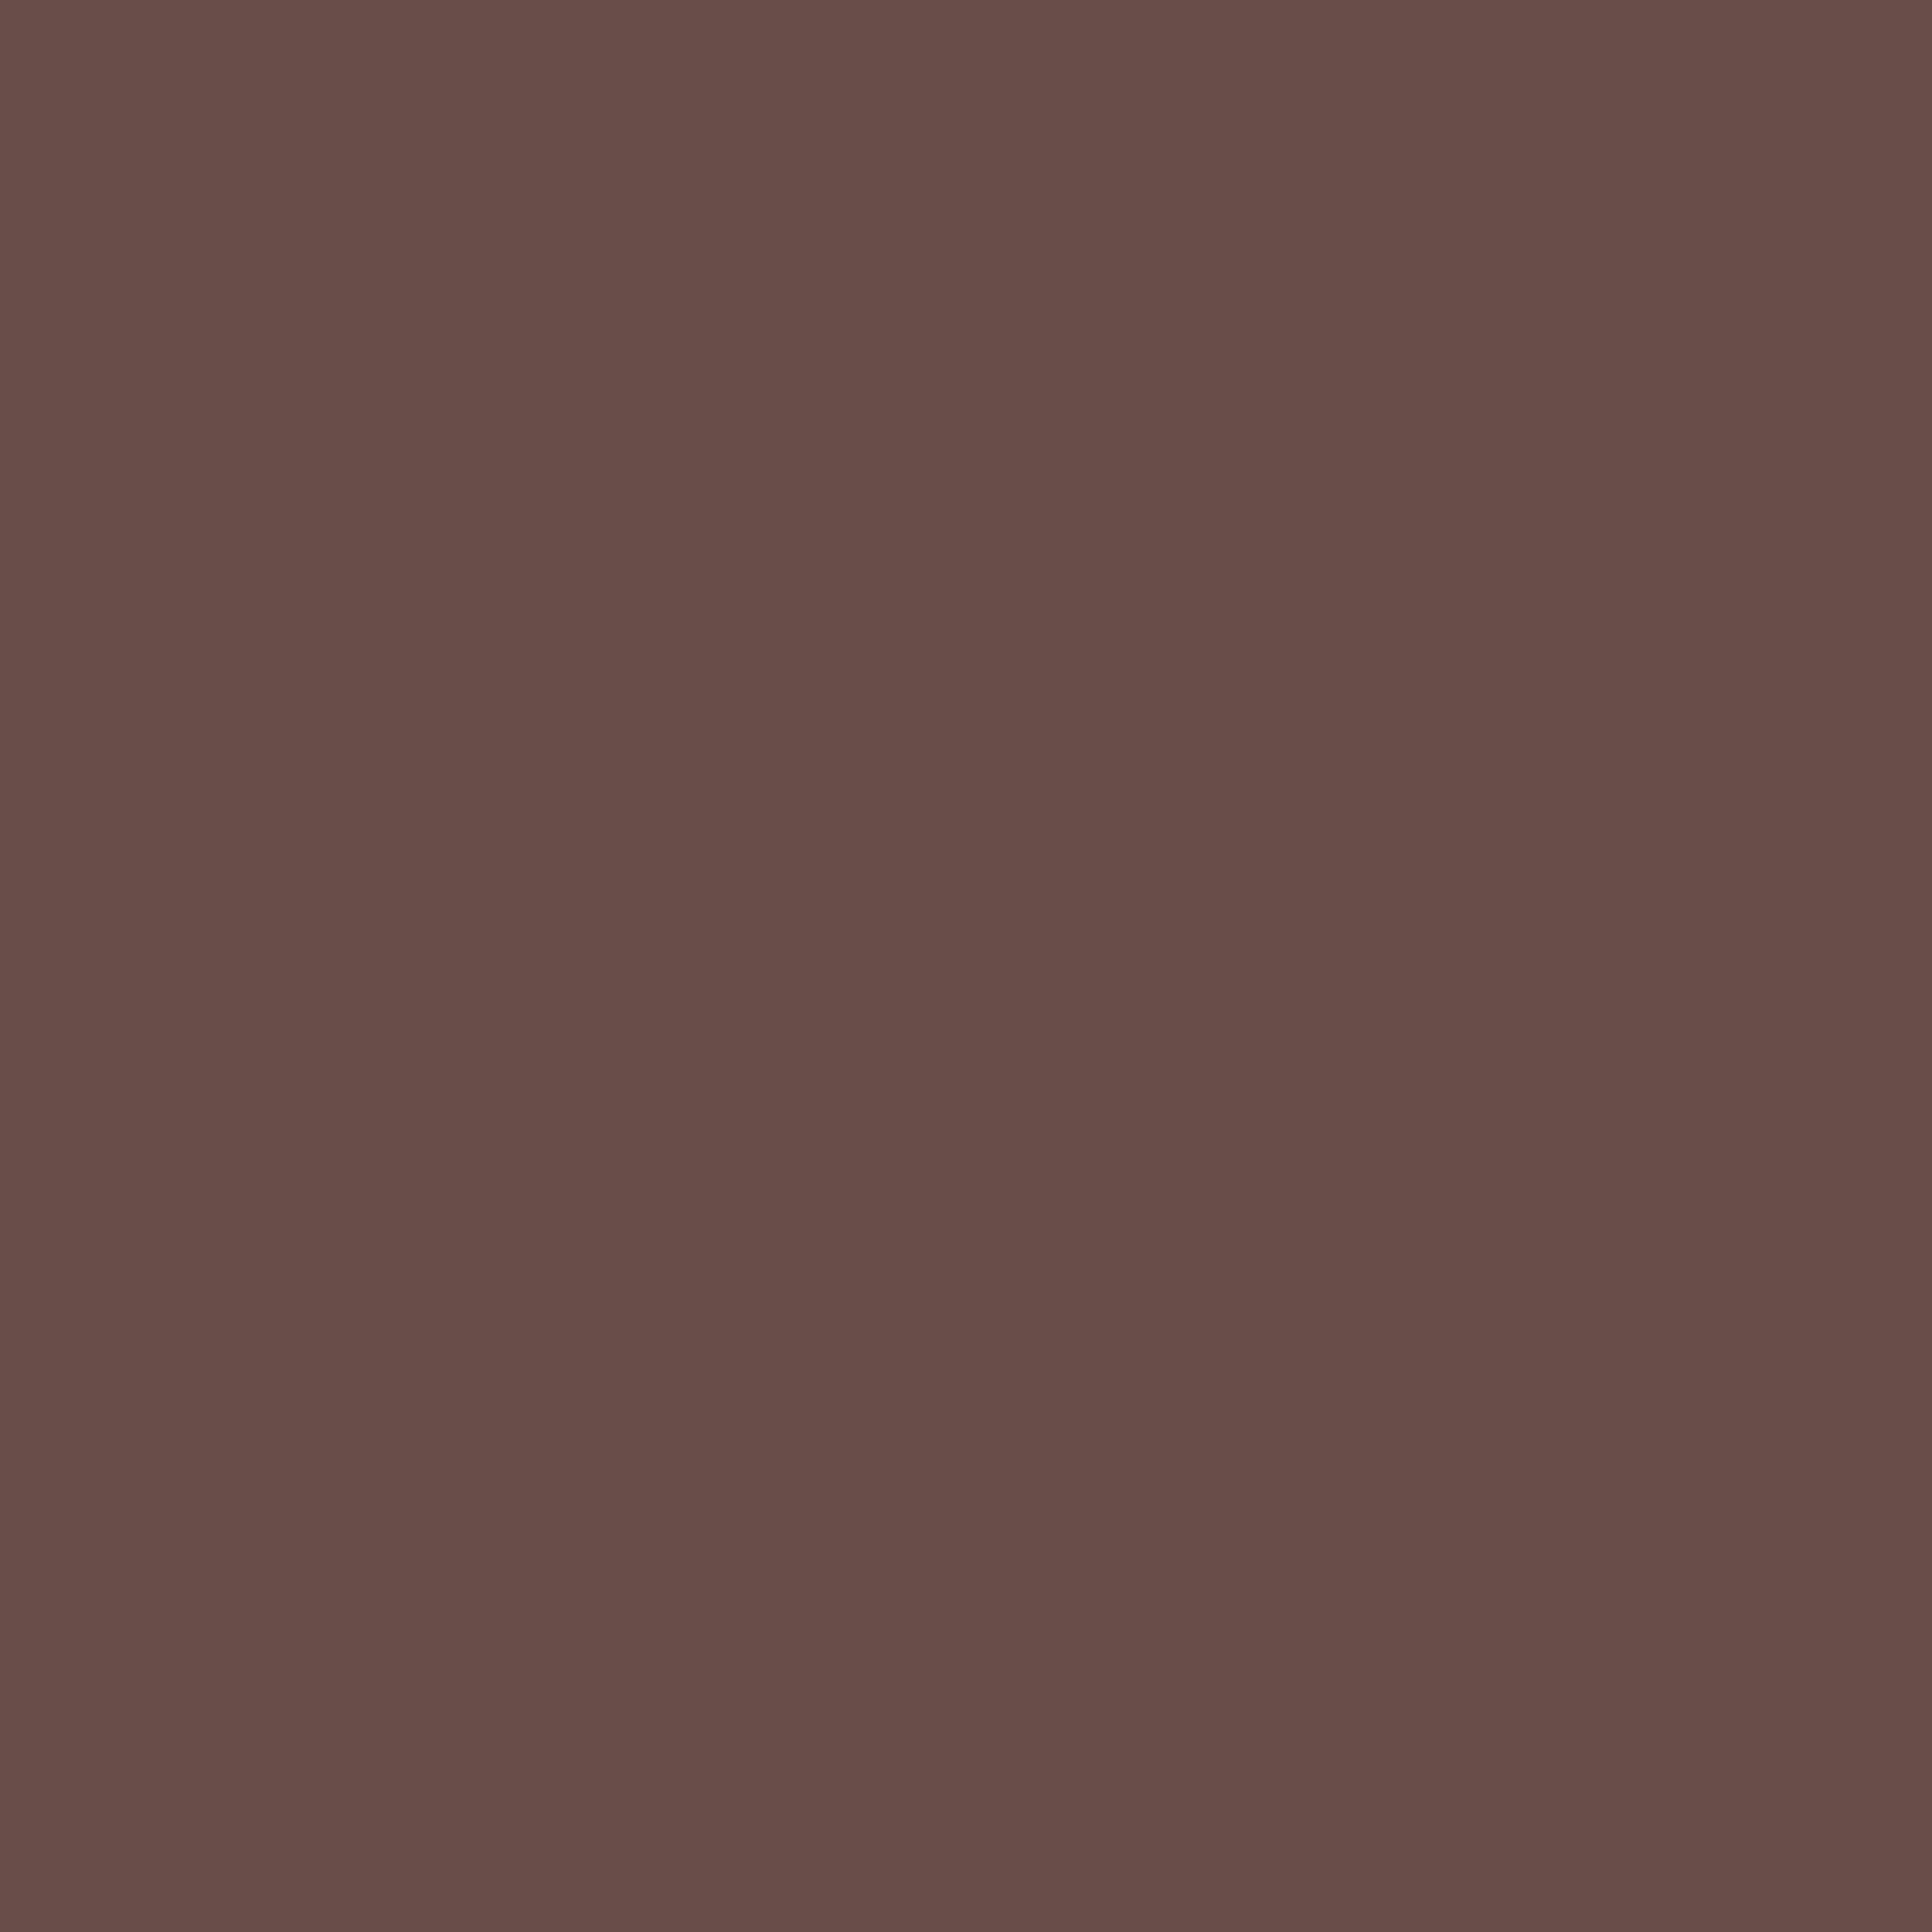 2732x2732 Liver Solid Color Background